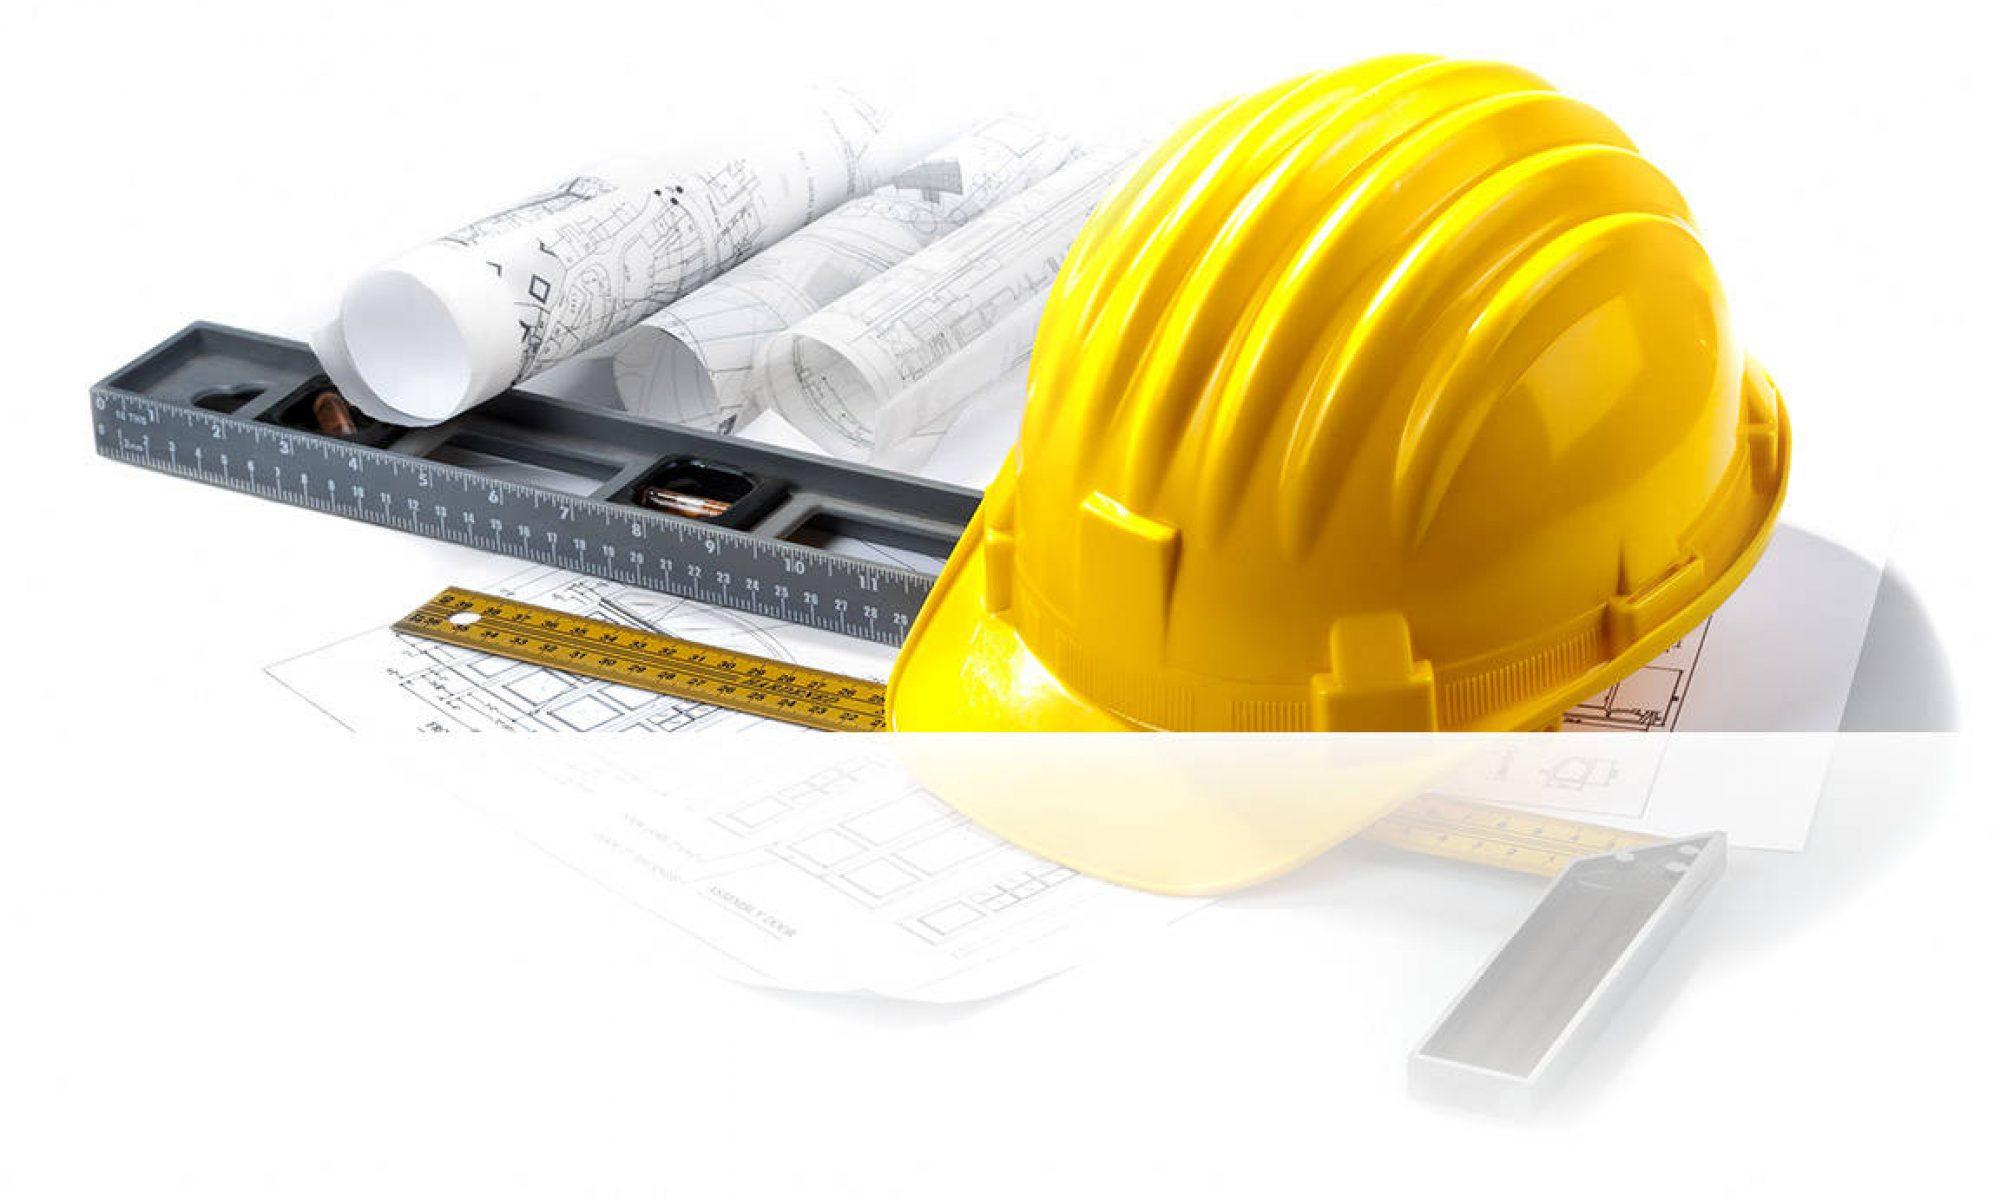 Arbetsmiljö & byggsäkerhet